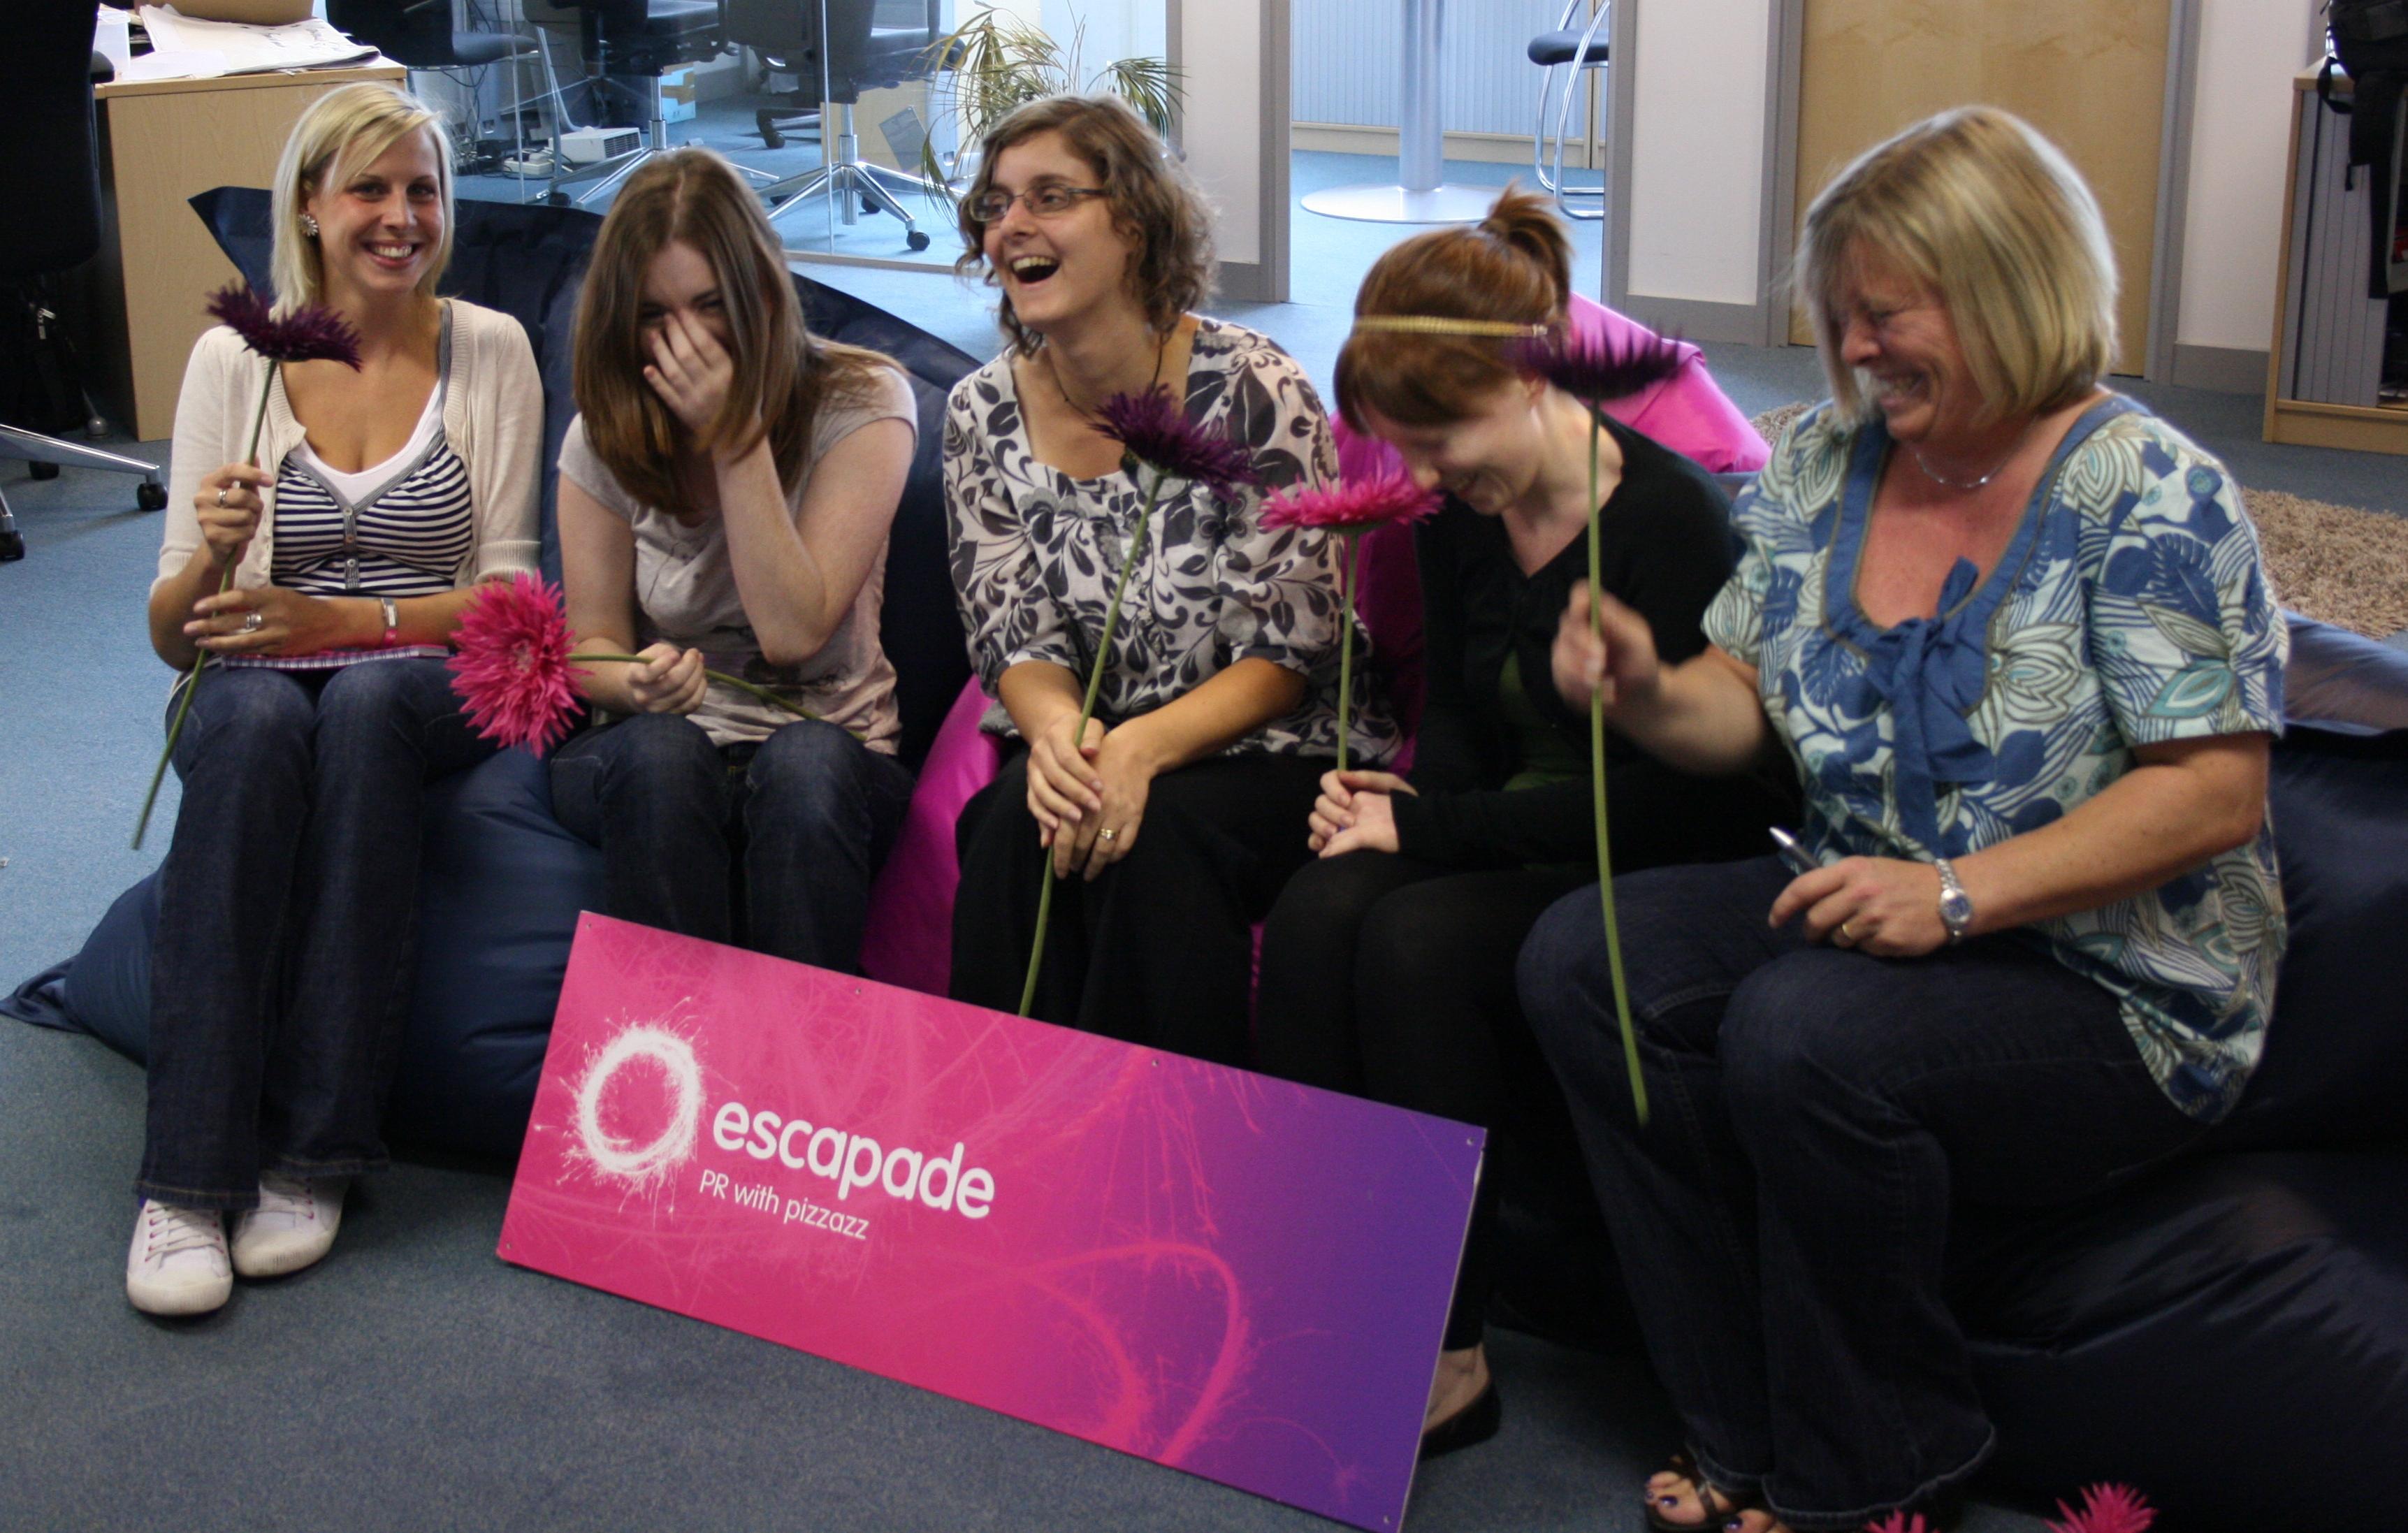 Having fun at work - the Escapade Team